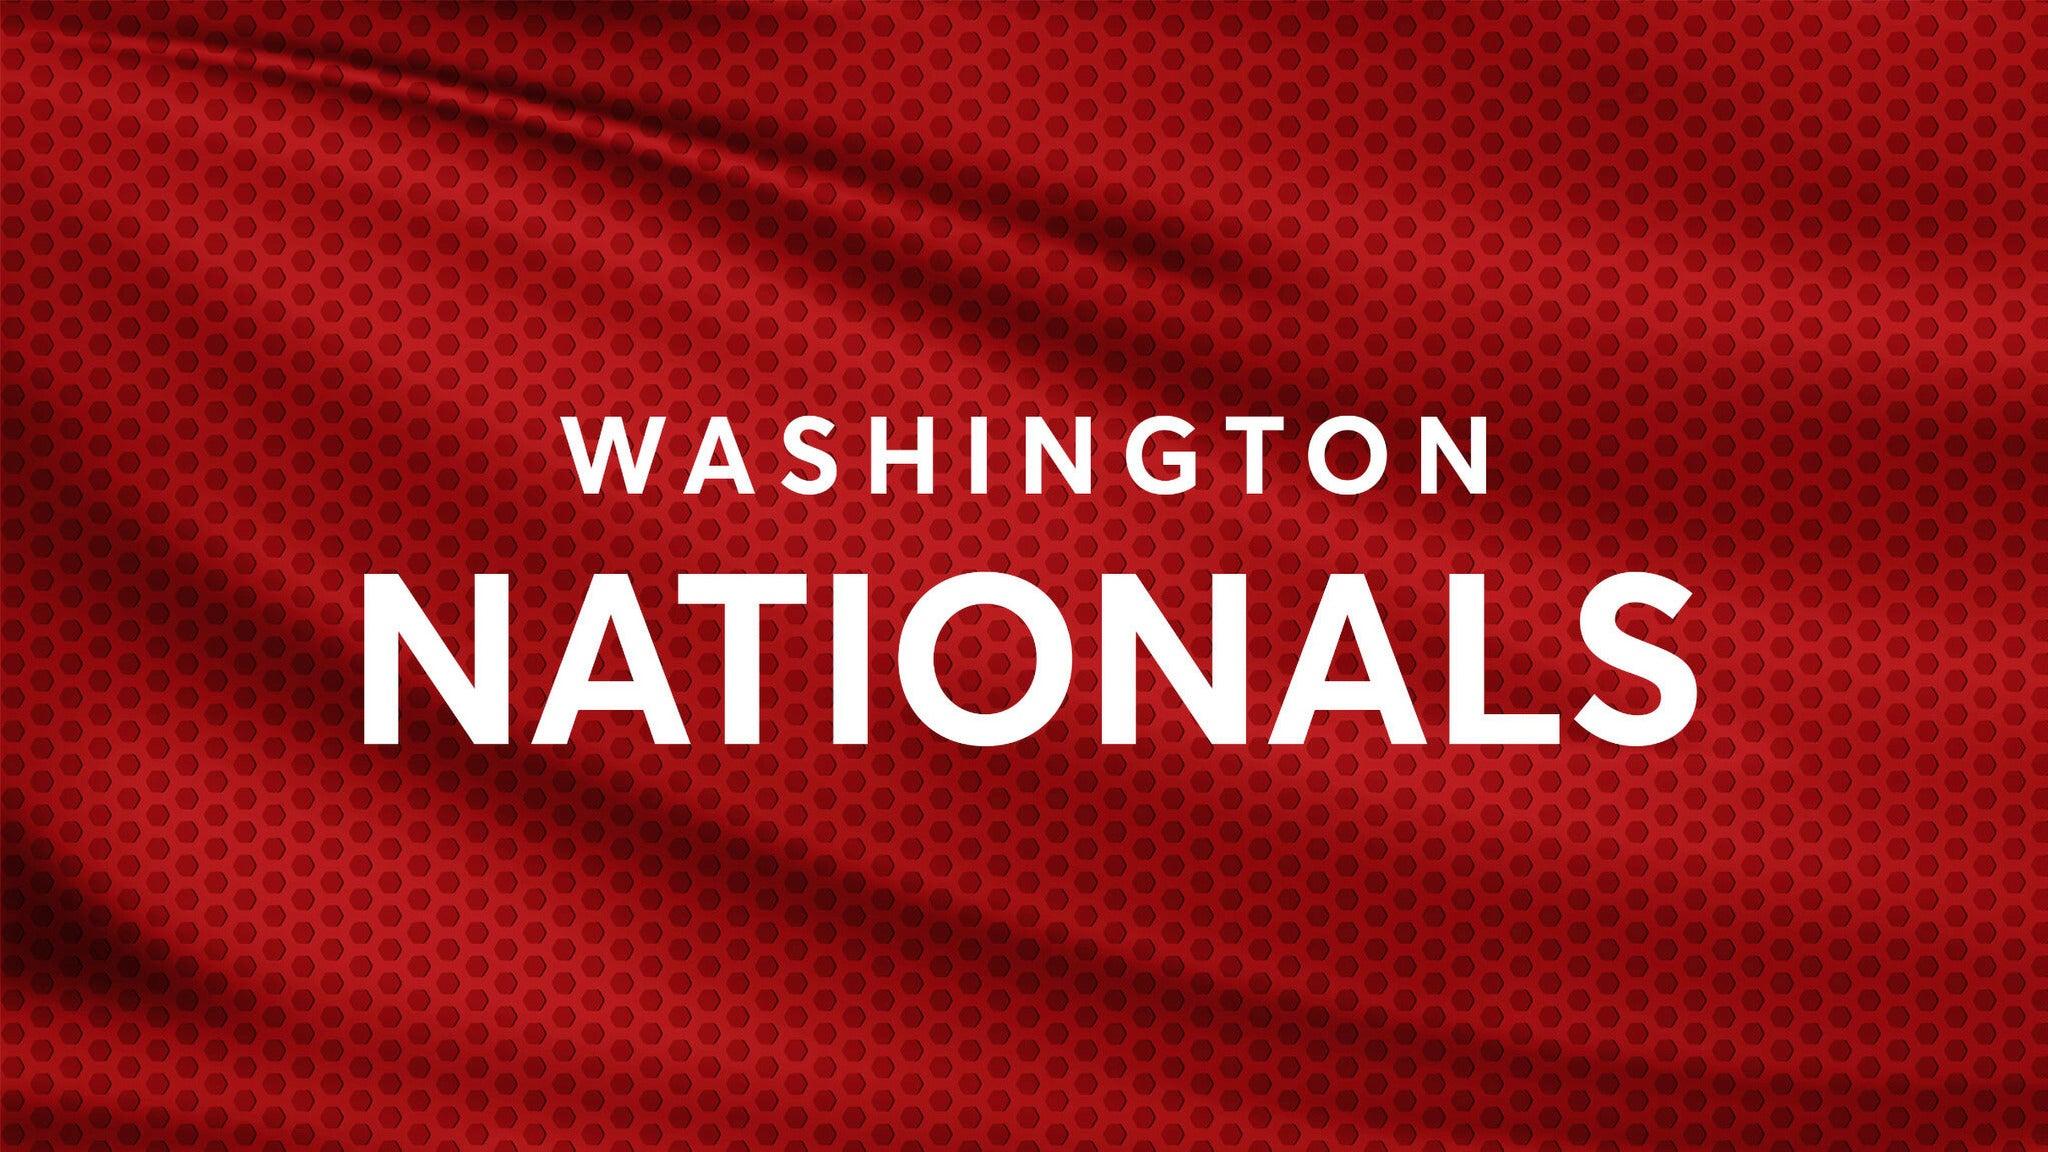 Washington Nationals vs. Arizona Diamondbacks